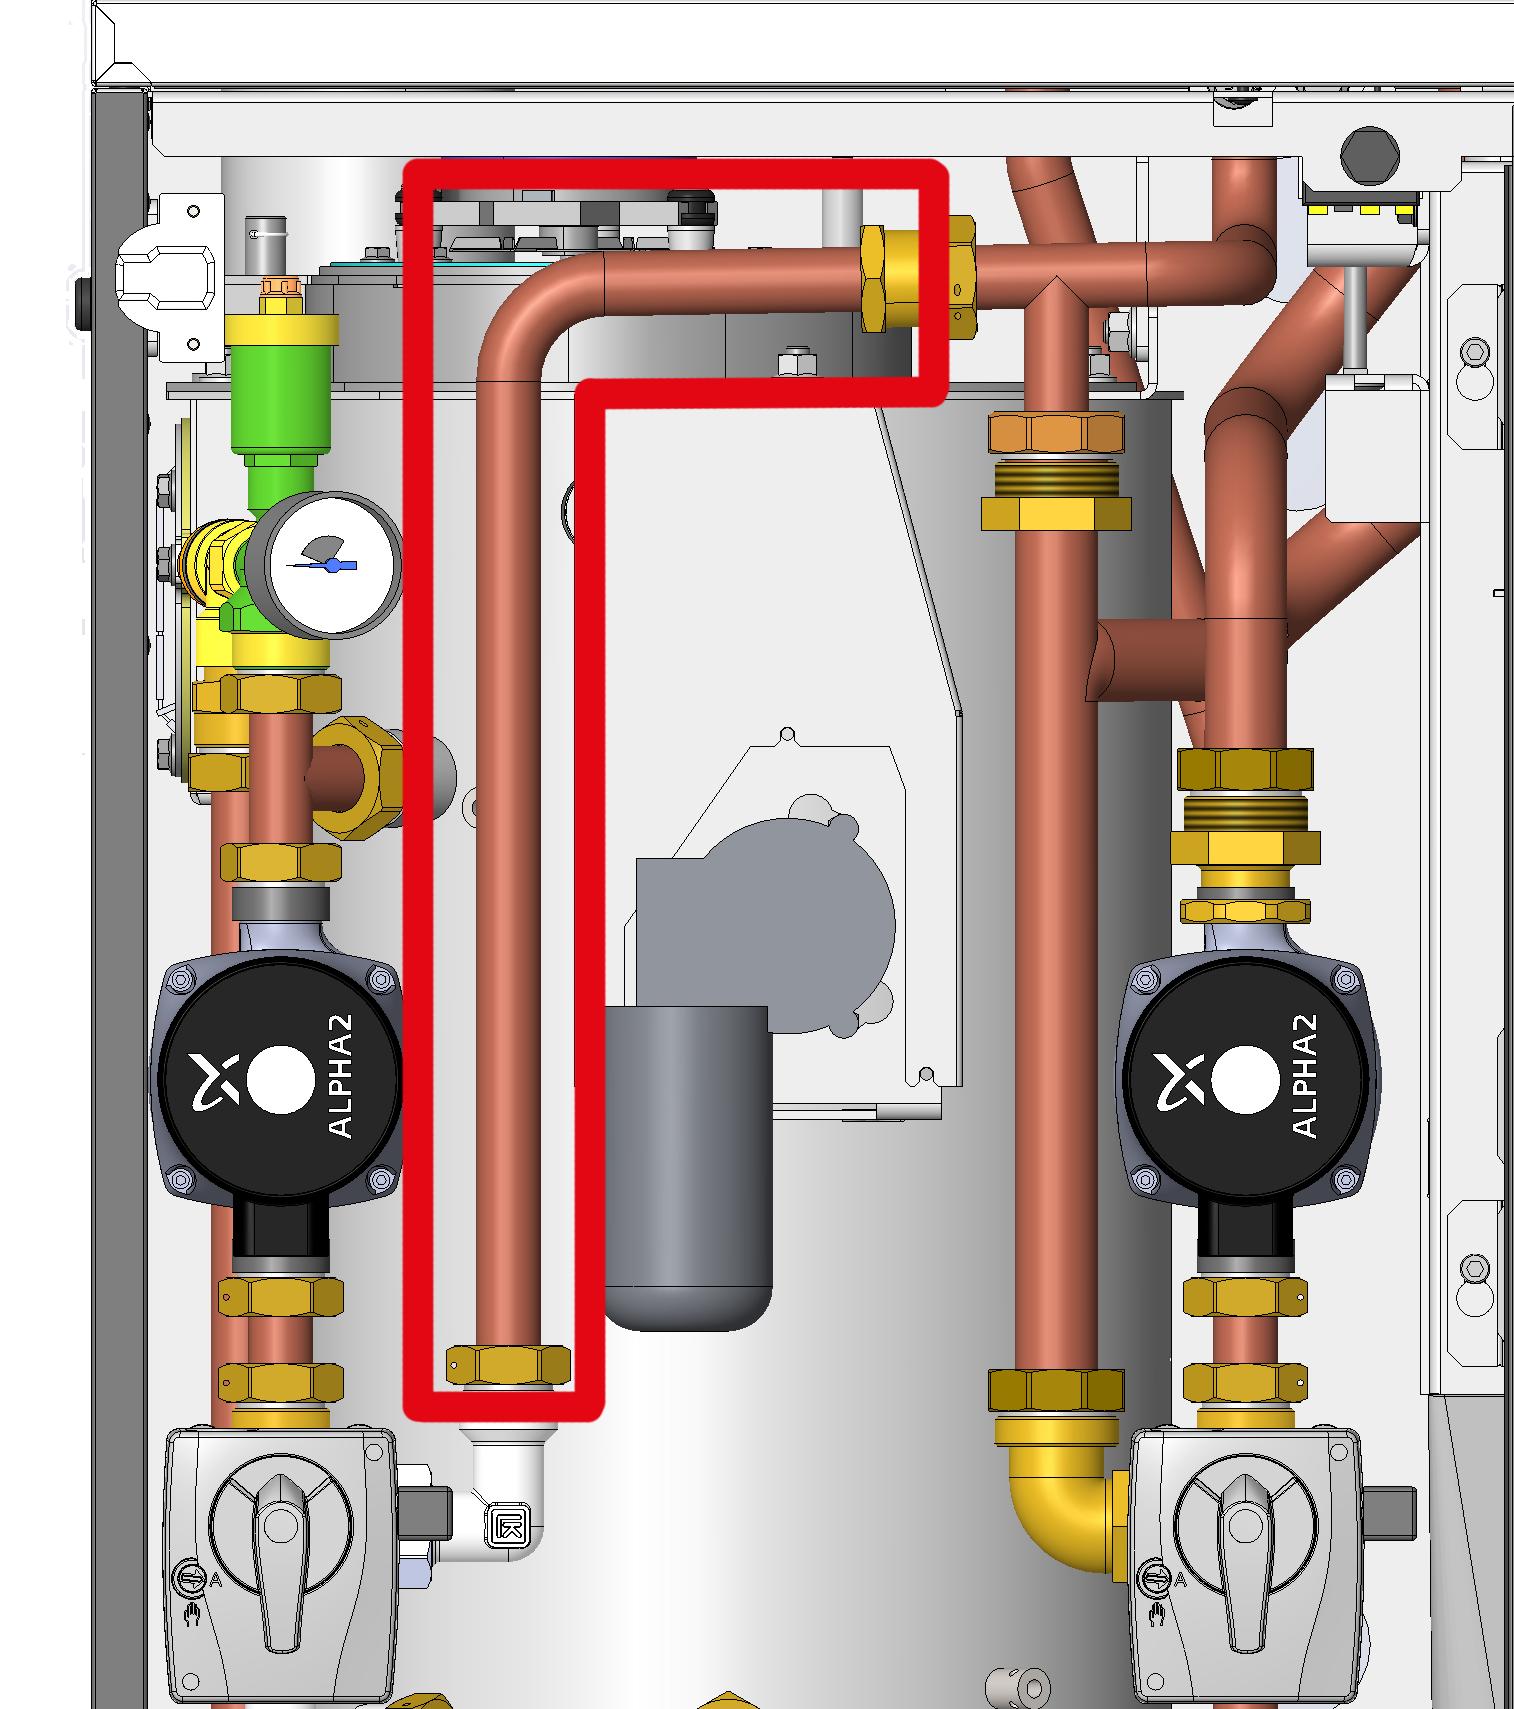 Hydraulik Bypassrohr für Rennergy Pellet Mini RPM6-15